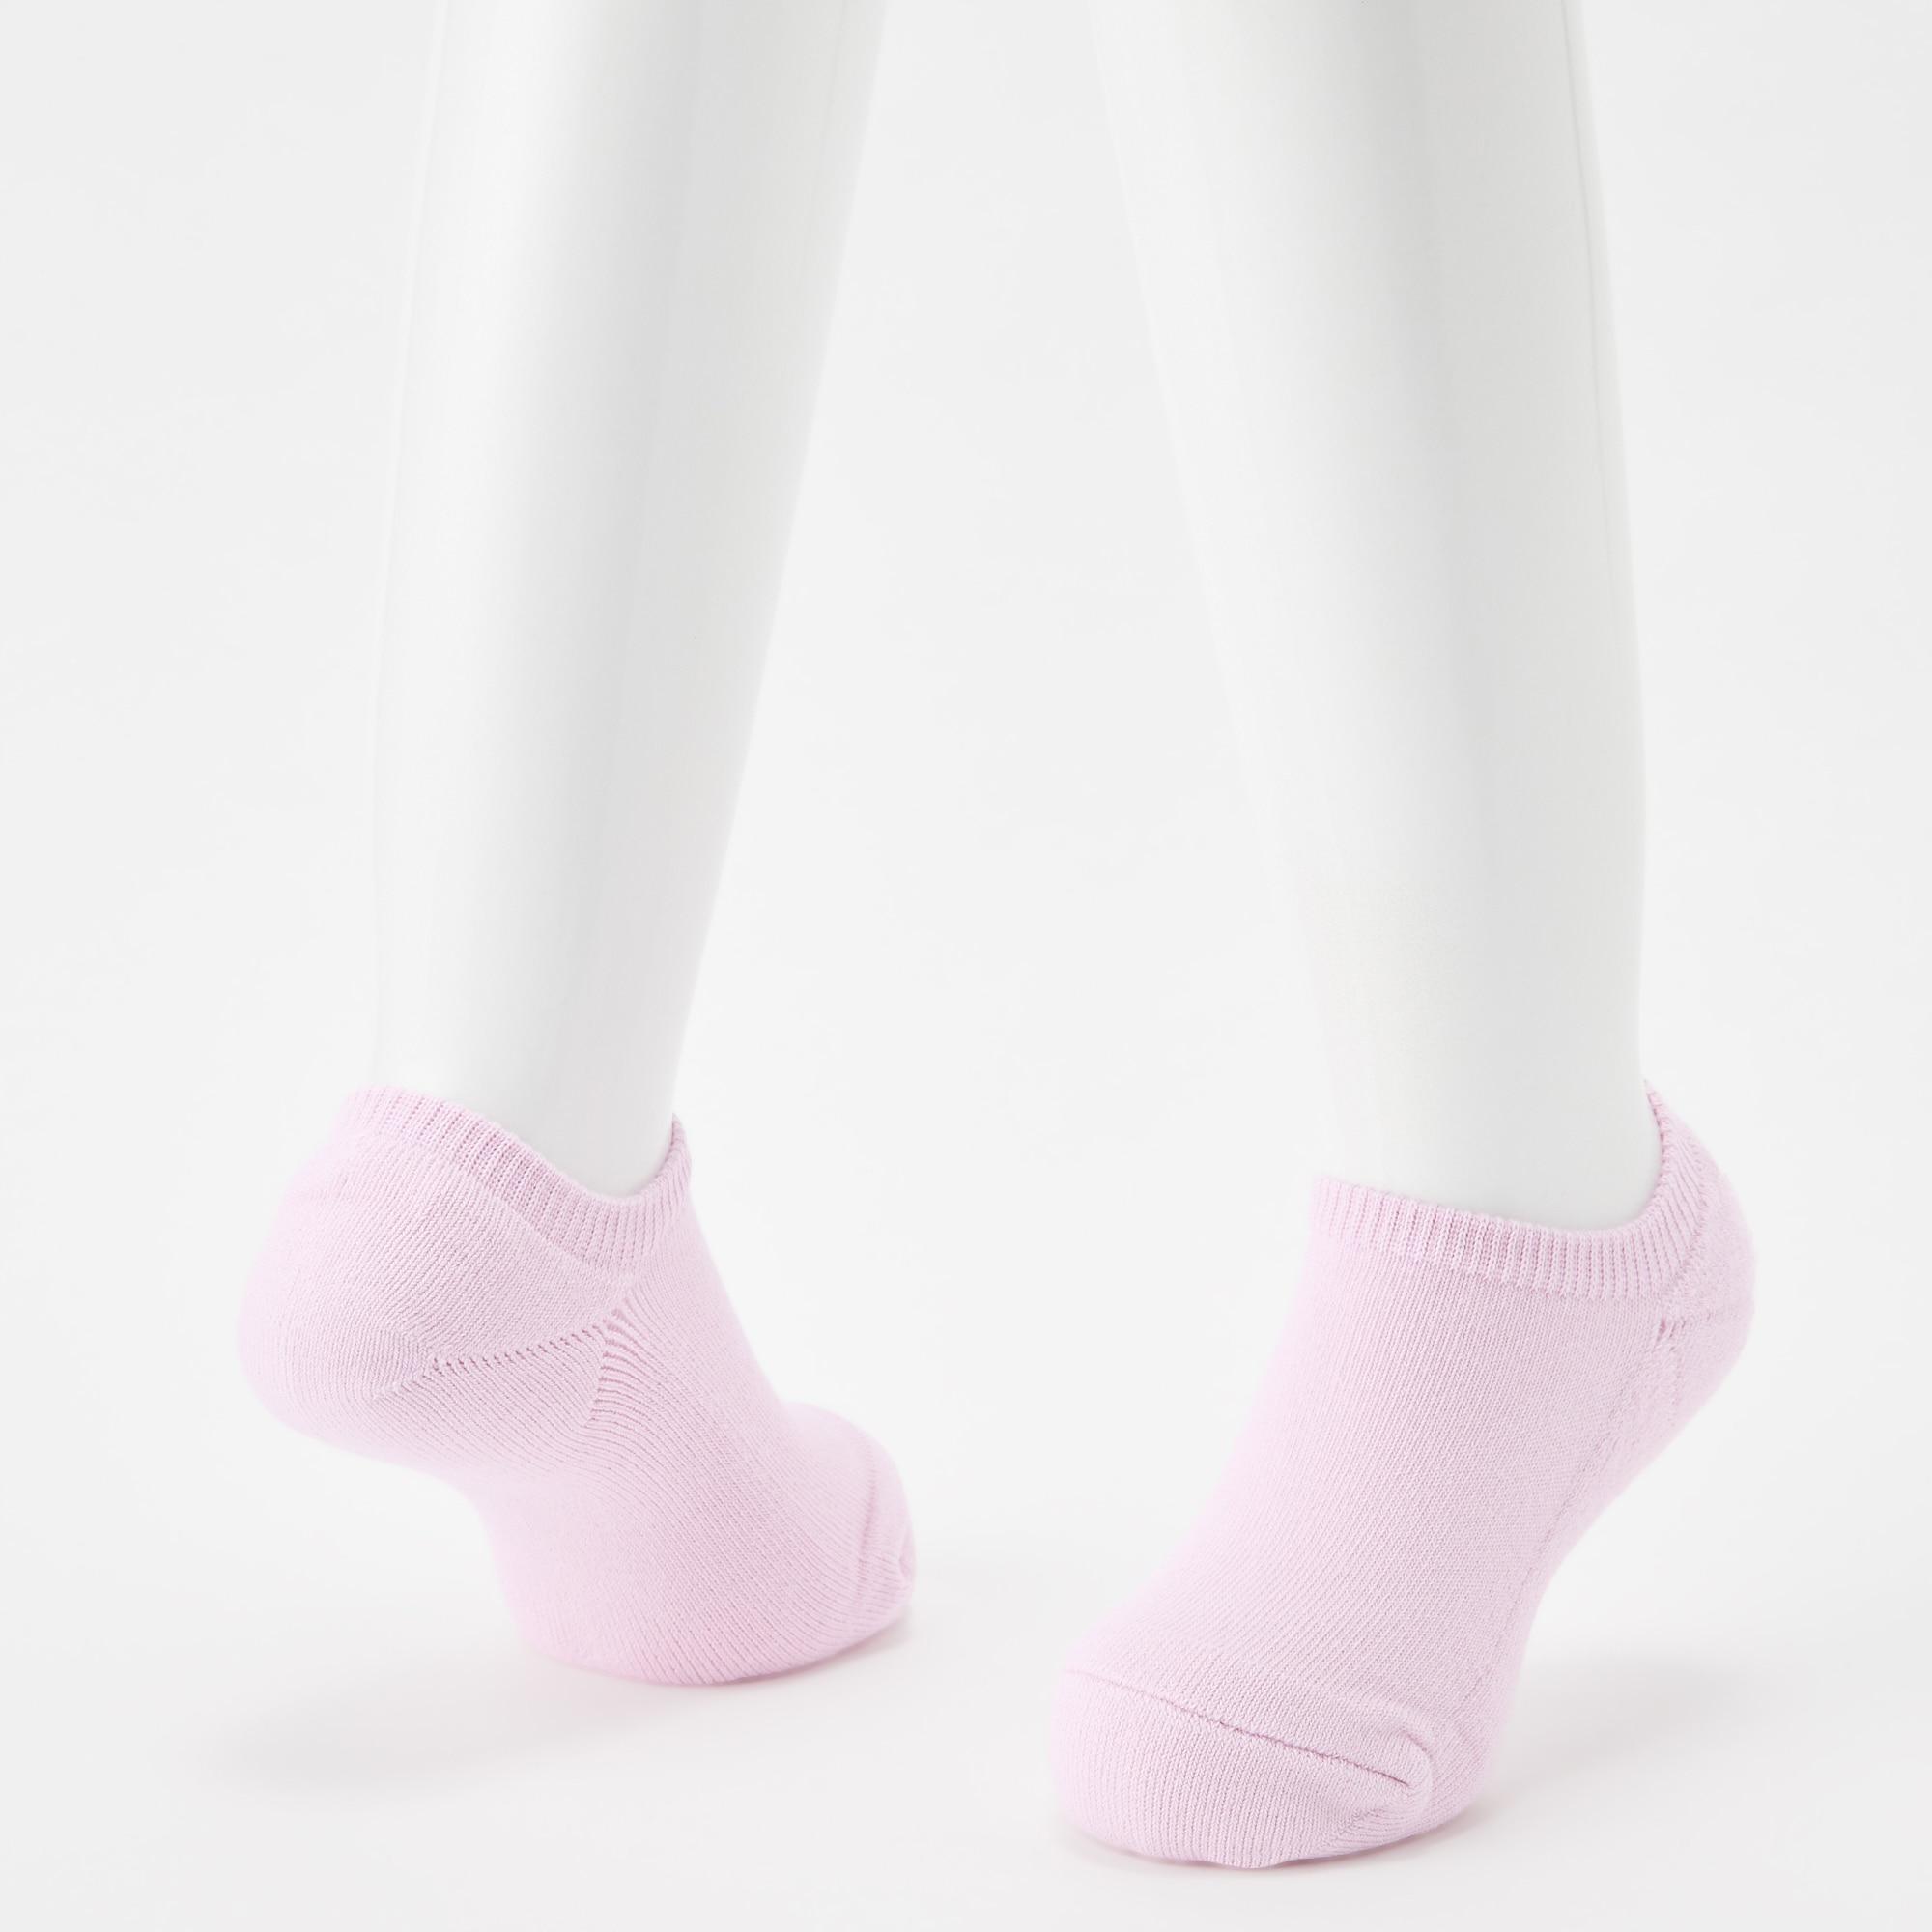 Uniqlo GIRLS SHORT SOCKS (SET OF 3)